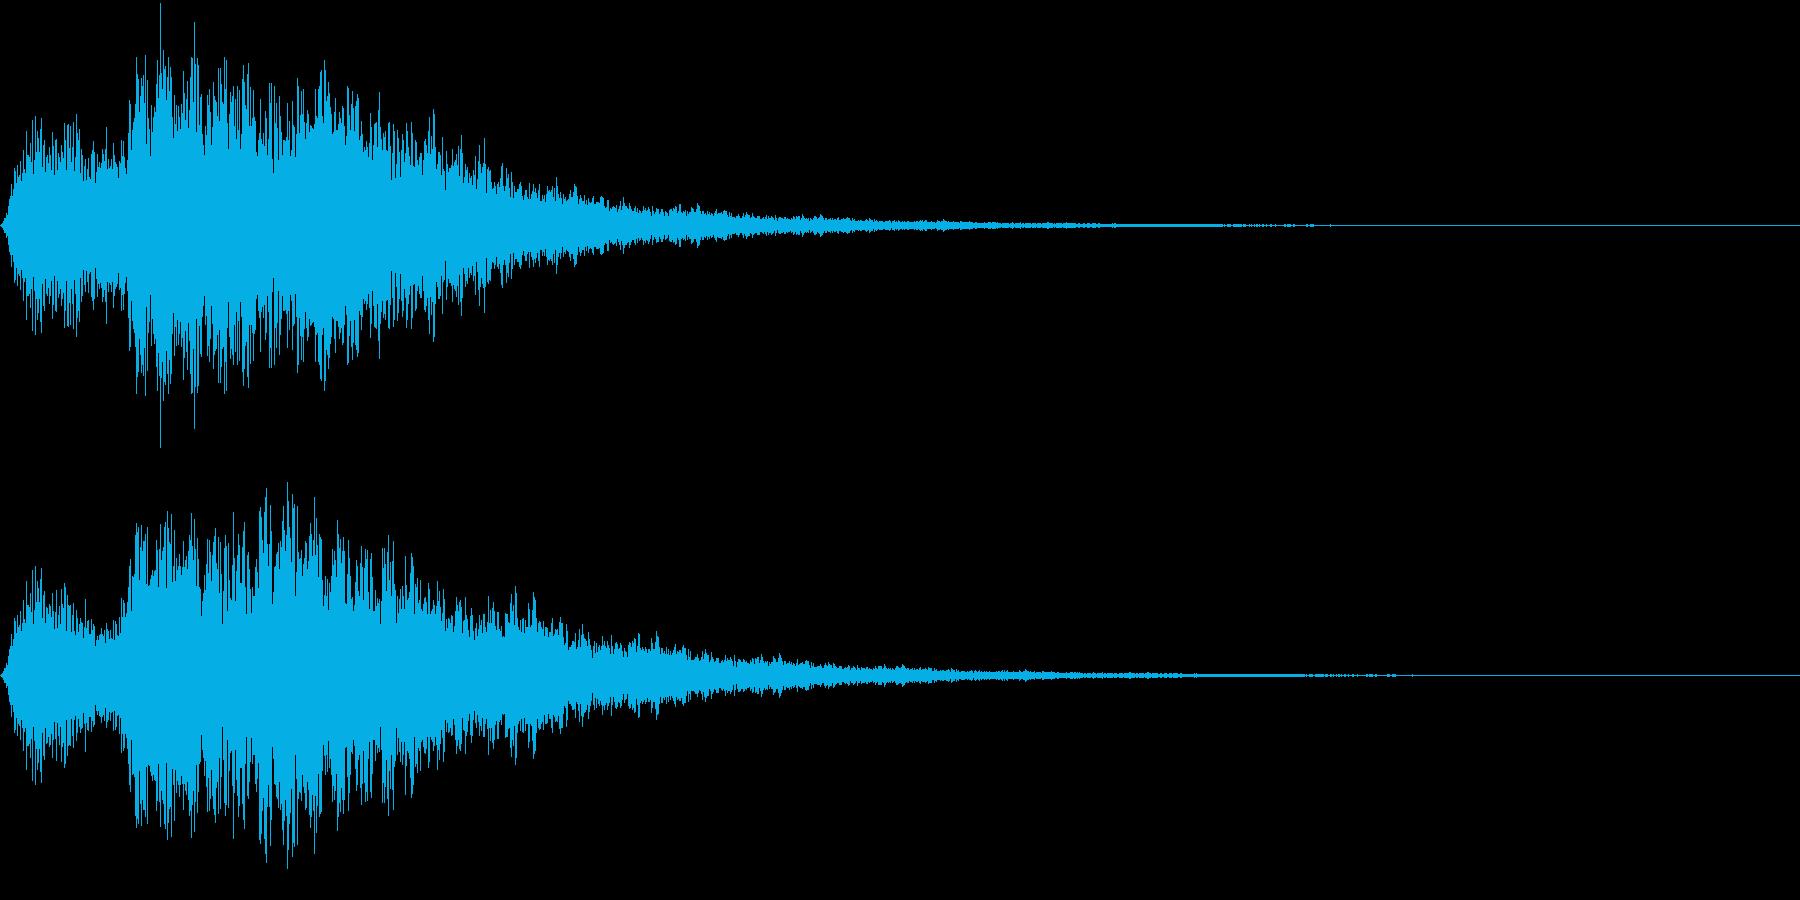 EMail 送受信音 ガラケー風 映像用の再生済みの波形